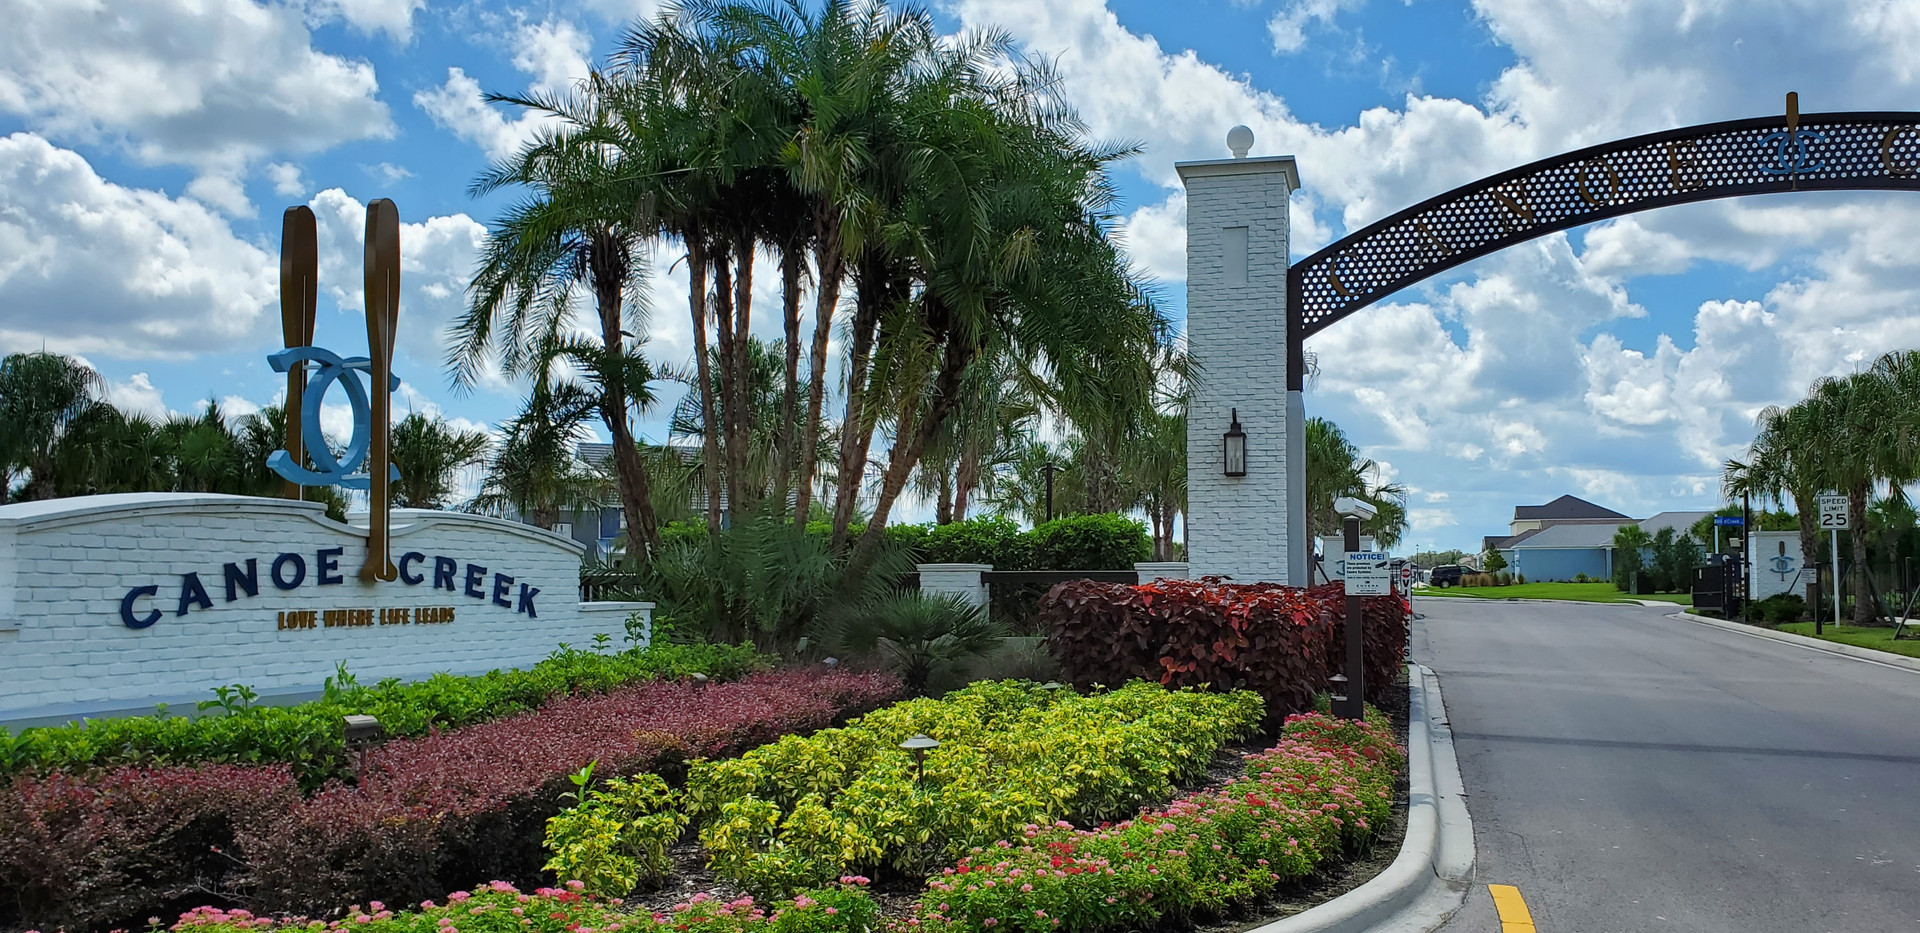 Canoe Creek new homes in Parrish FL